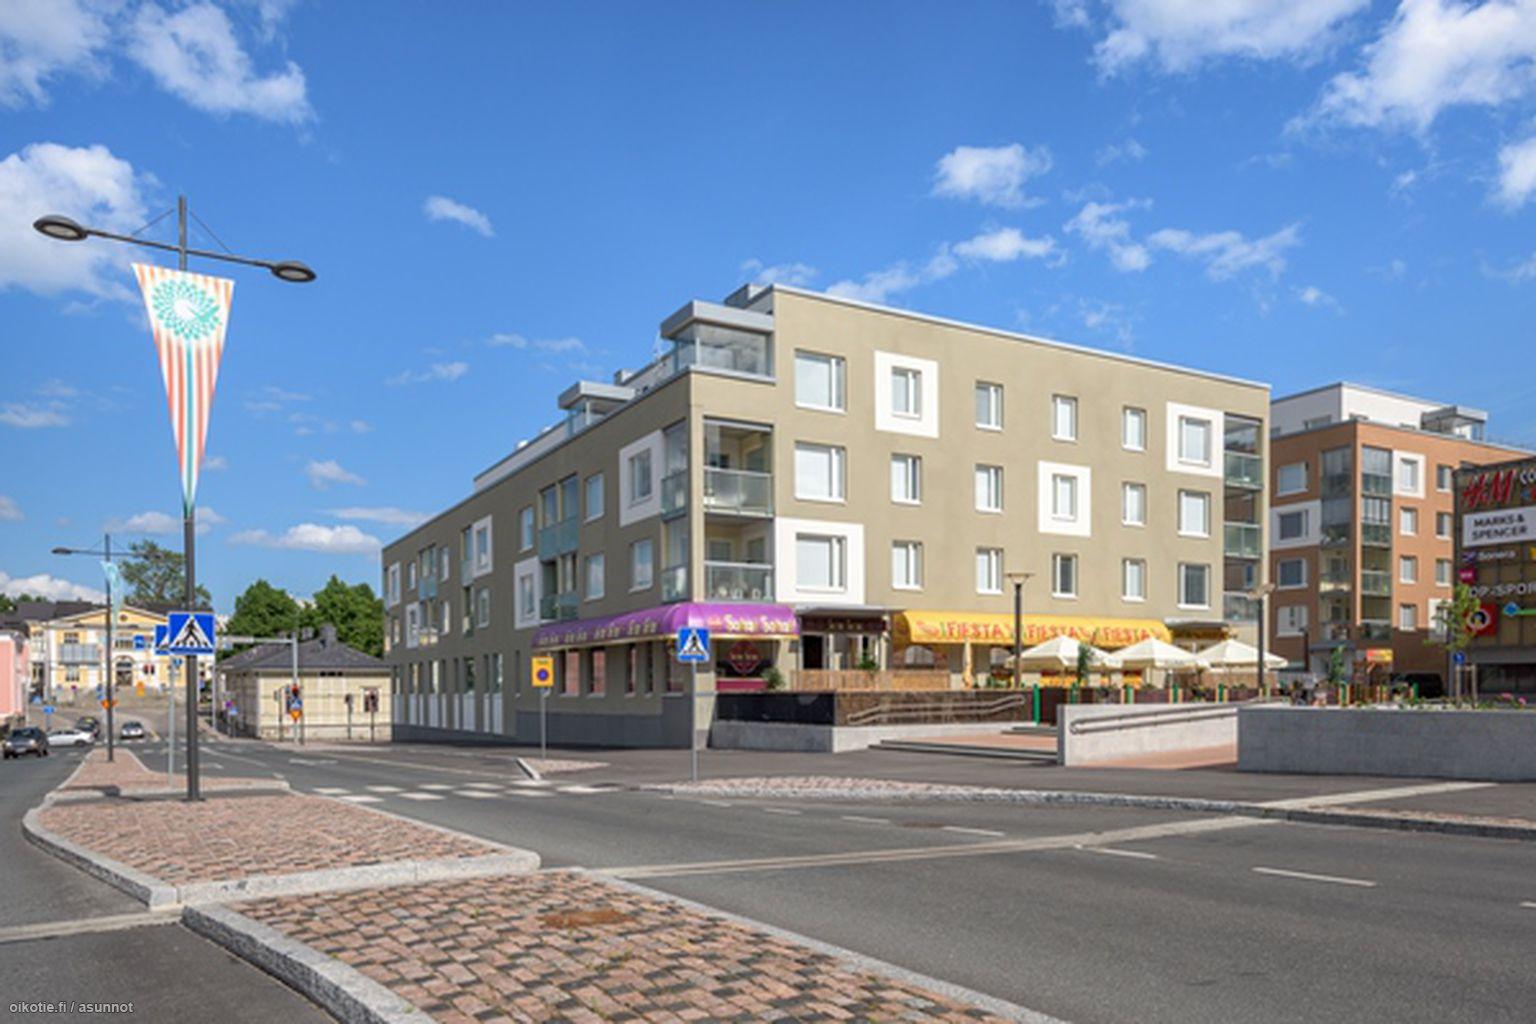 Vuokrattavat Asunnot Hämeenlinna